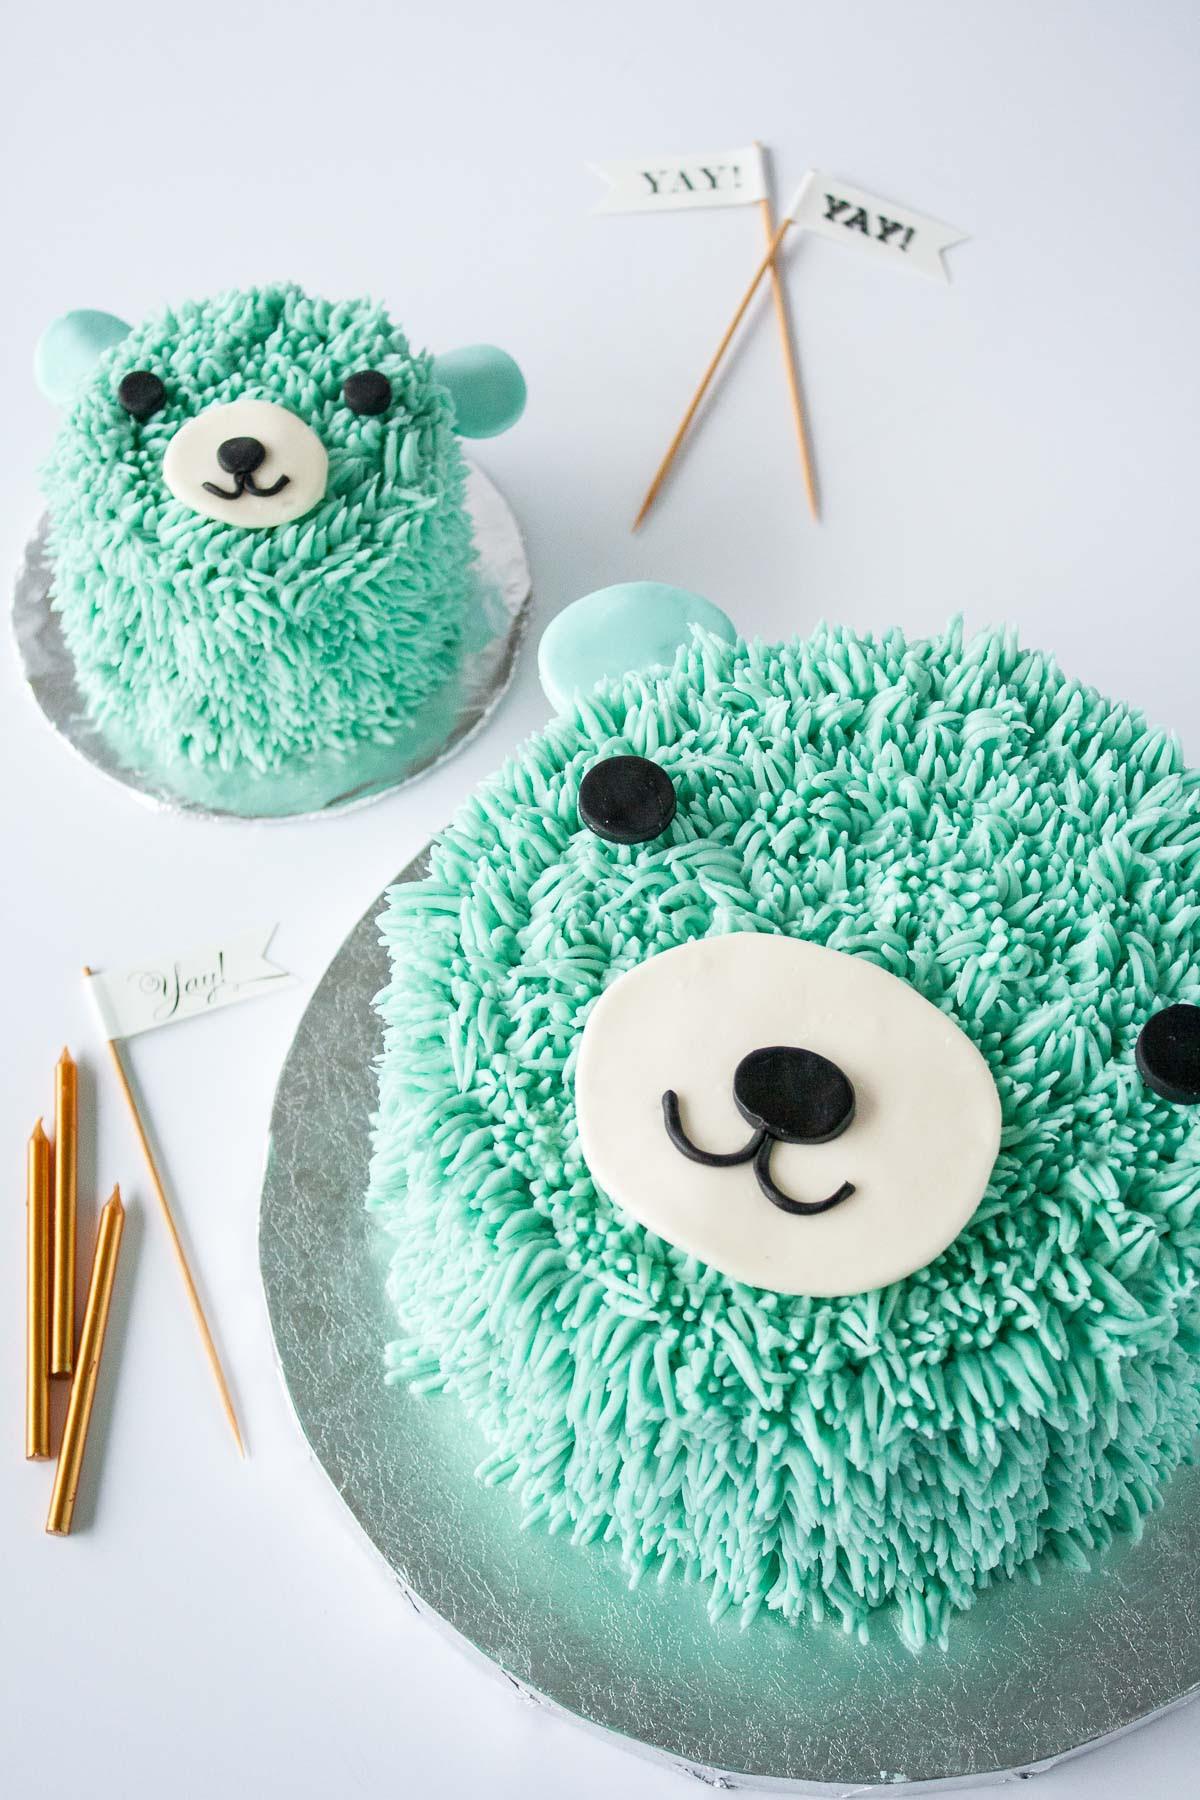 Fantastic Cake Decorations Cute Simple Cake Decorating Ideas Funny Birthday Cards Online Inifodamsfinfo